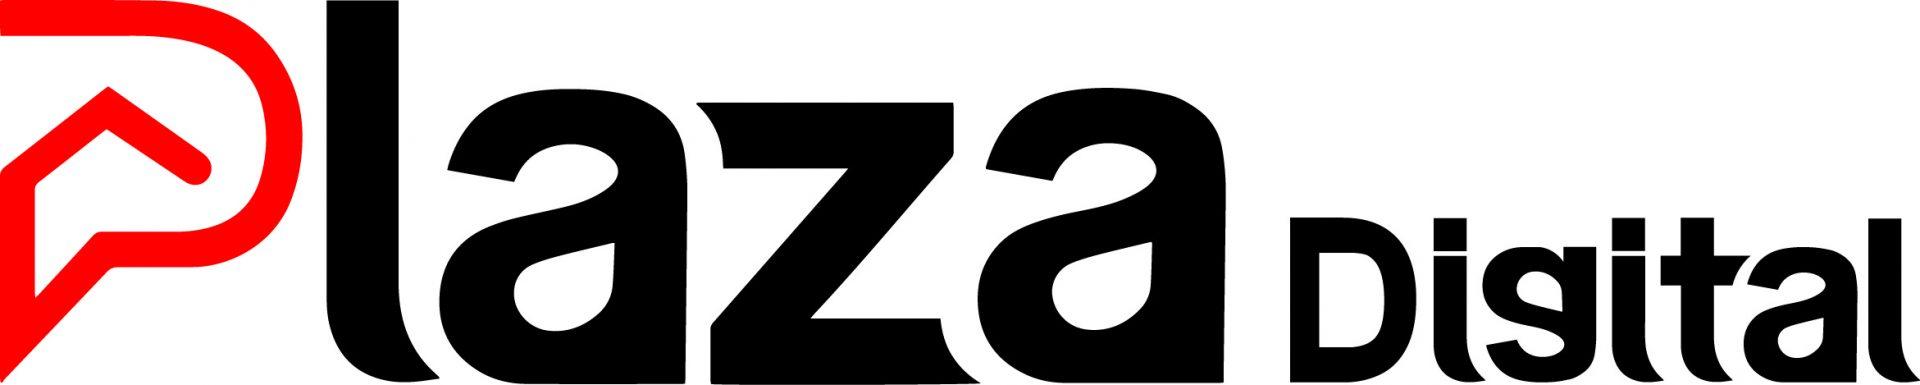 plazadigital